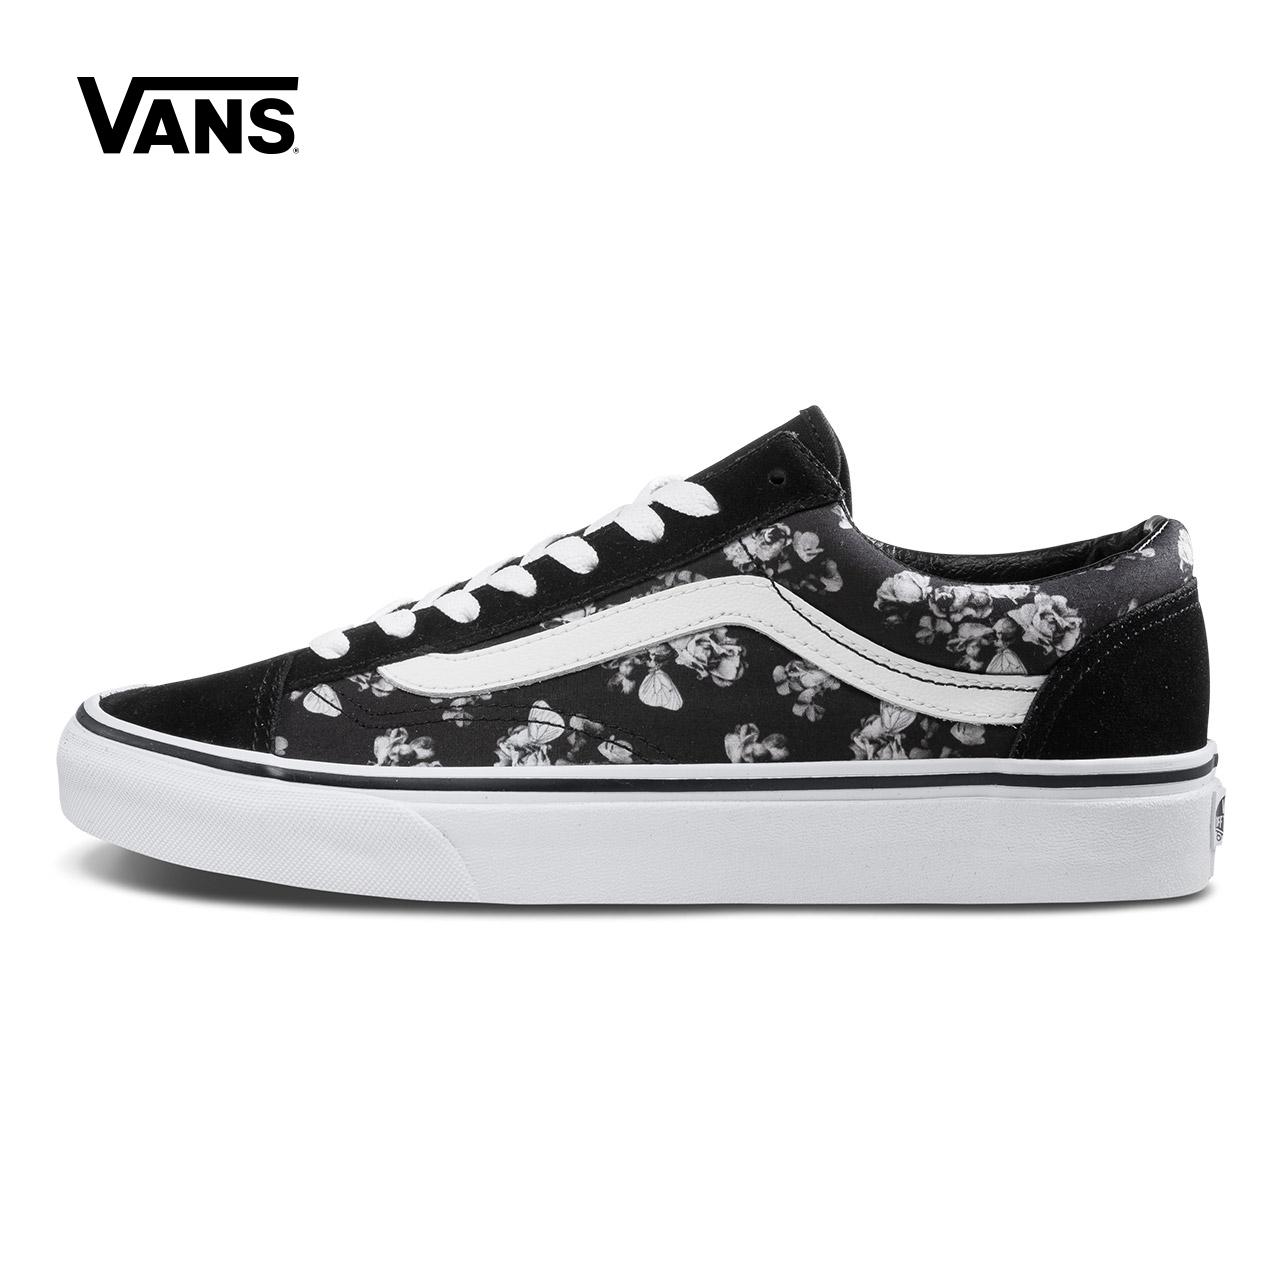 Vans 范斯官方男女款STYLE 36板鞋|VN0A3DZ3SJG